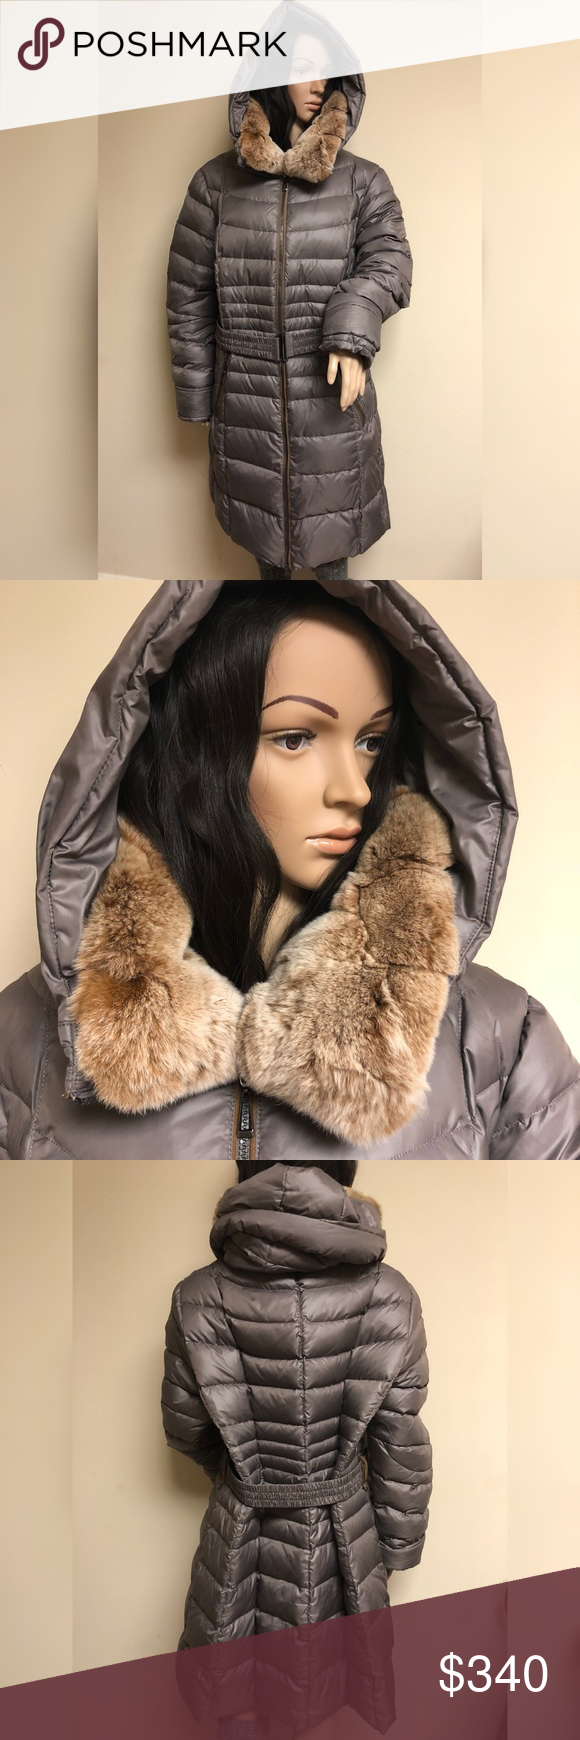 Sold Vlasta Duck Downs Gray Puffer Jacket 58 3xl Jackets Puffer Jackets Puffer [ 1740 x 580 Pixel ]